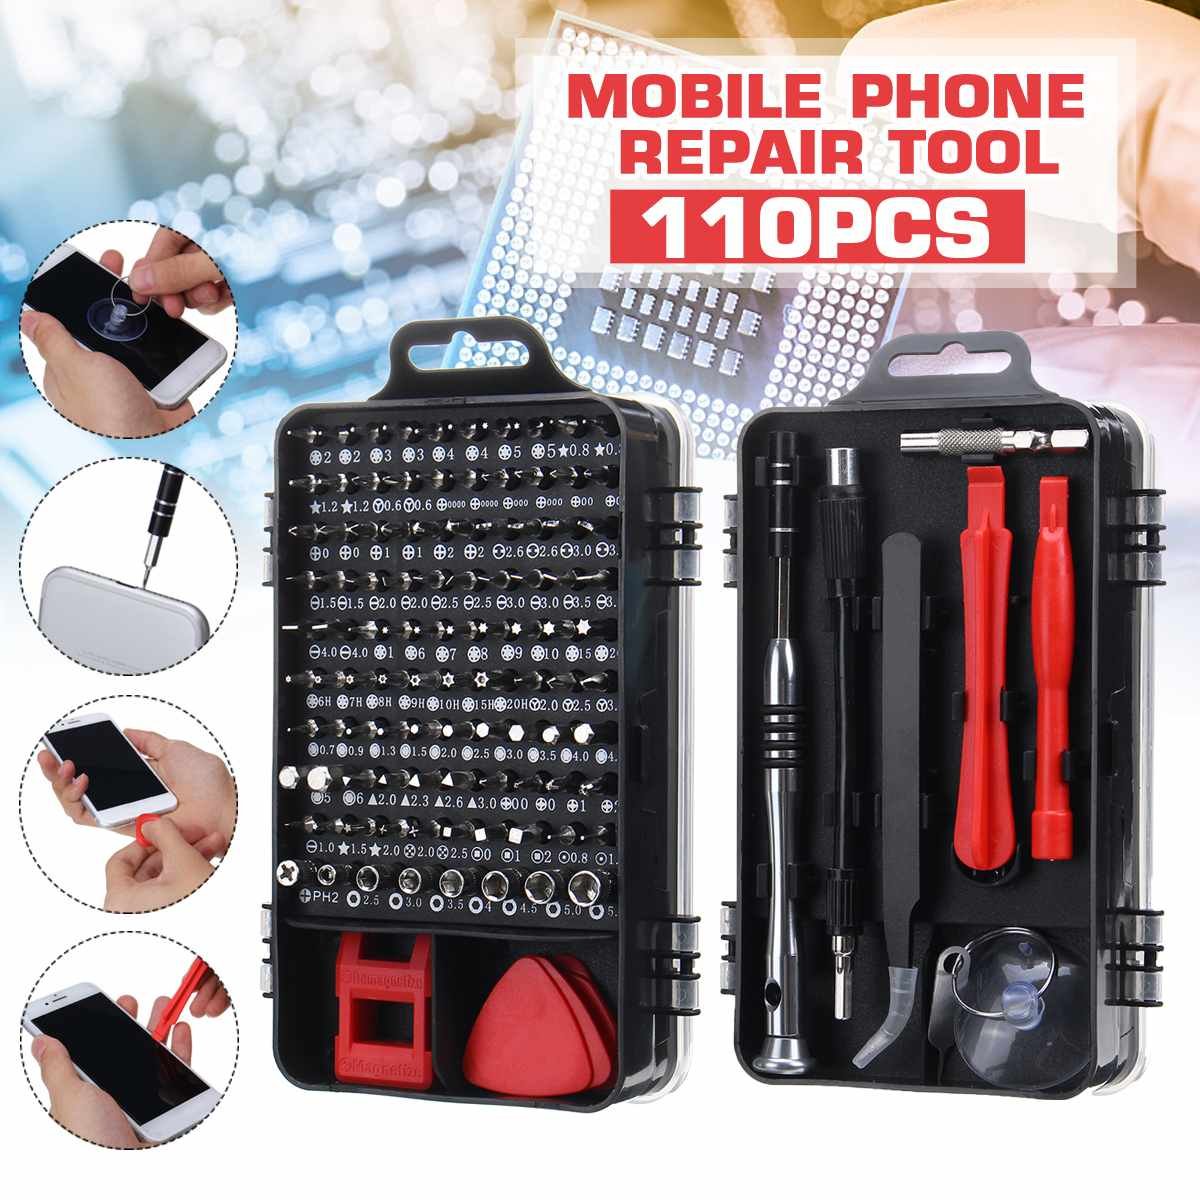 1 Screwdriver Set Magnetic Screwdriver Bit Torx Multi Mobile Phone Computer Repair Tools Kit Electronic Device Hand Tool